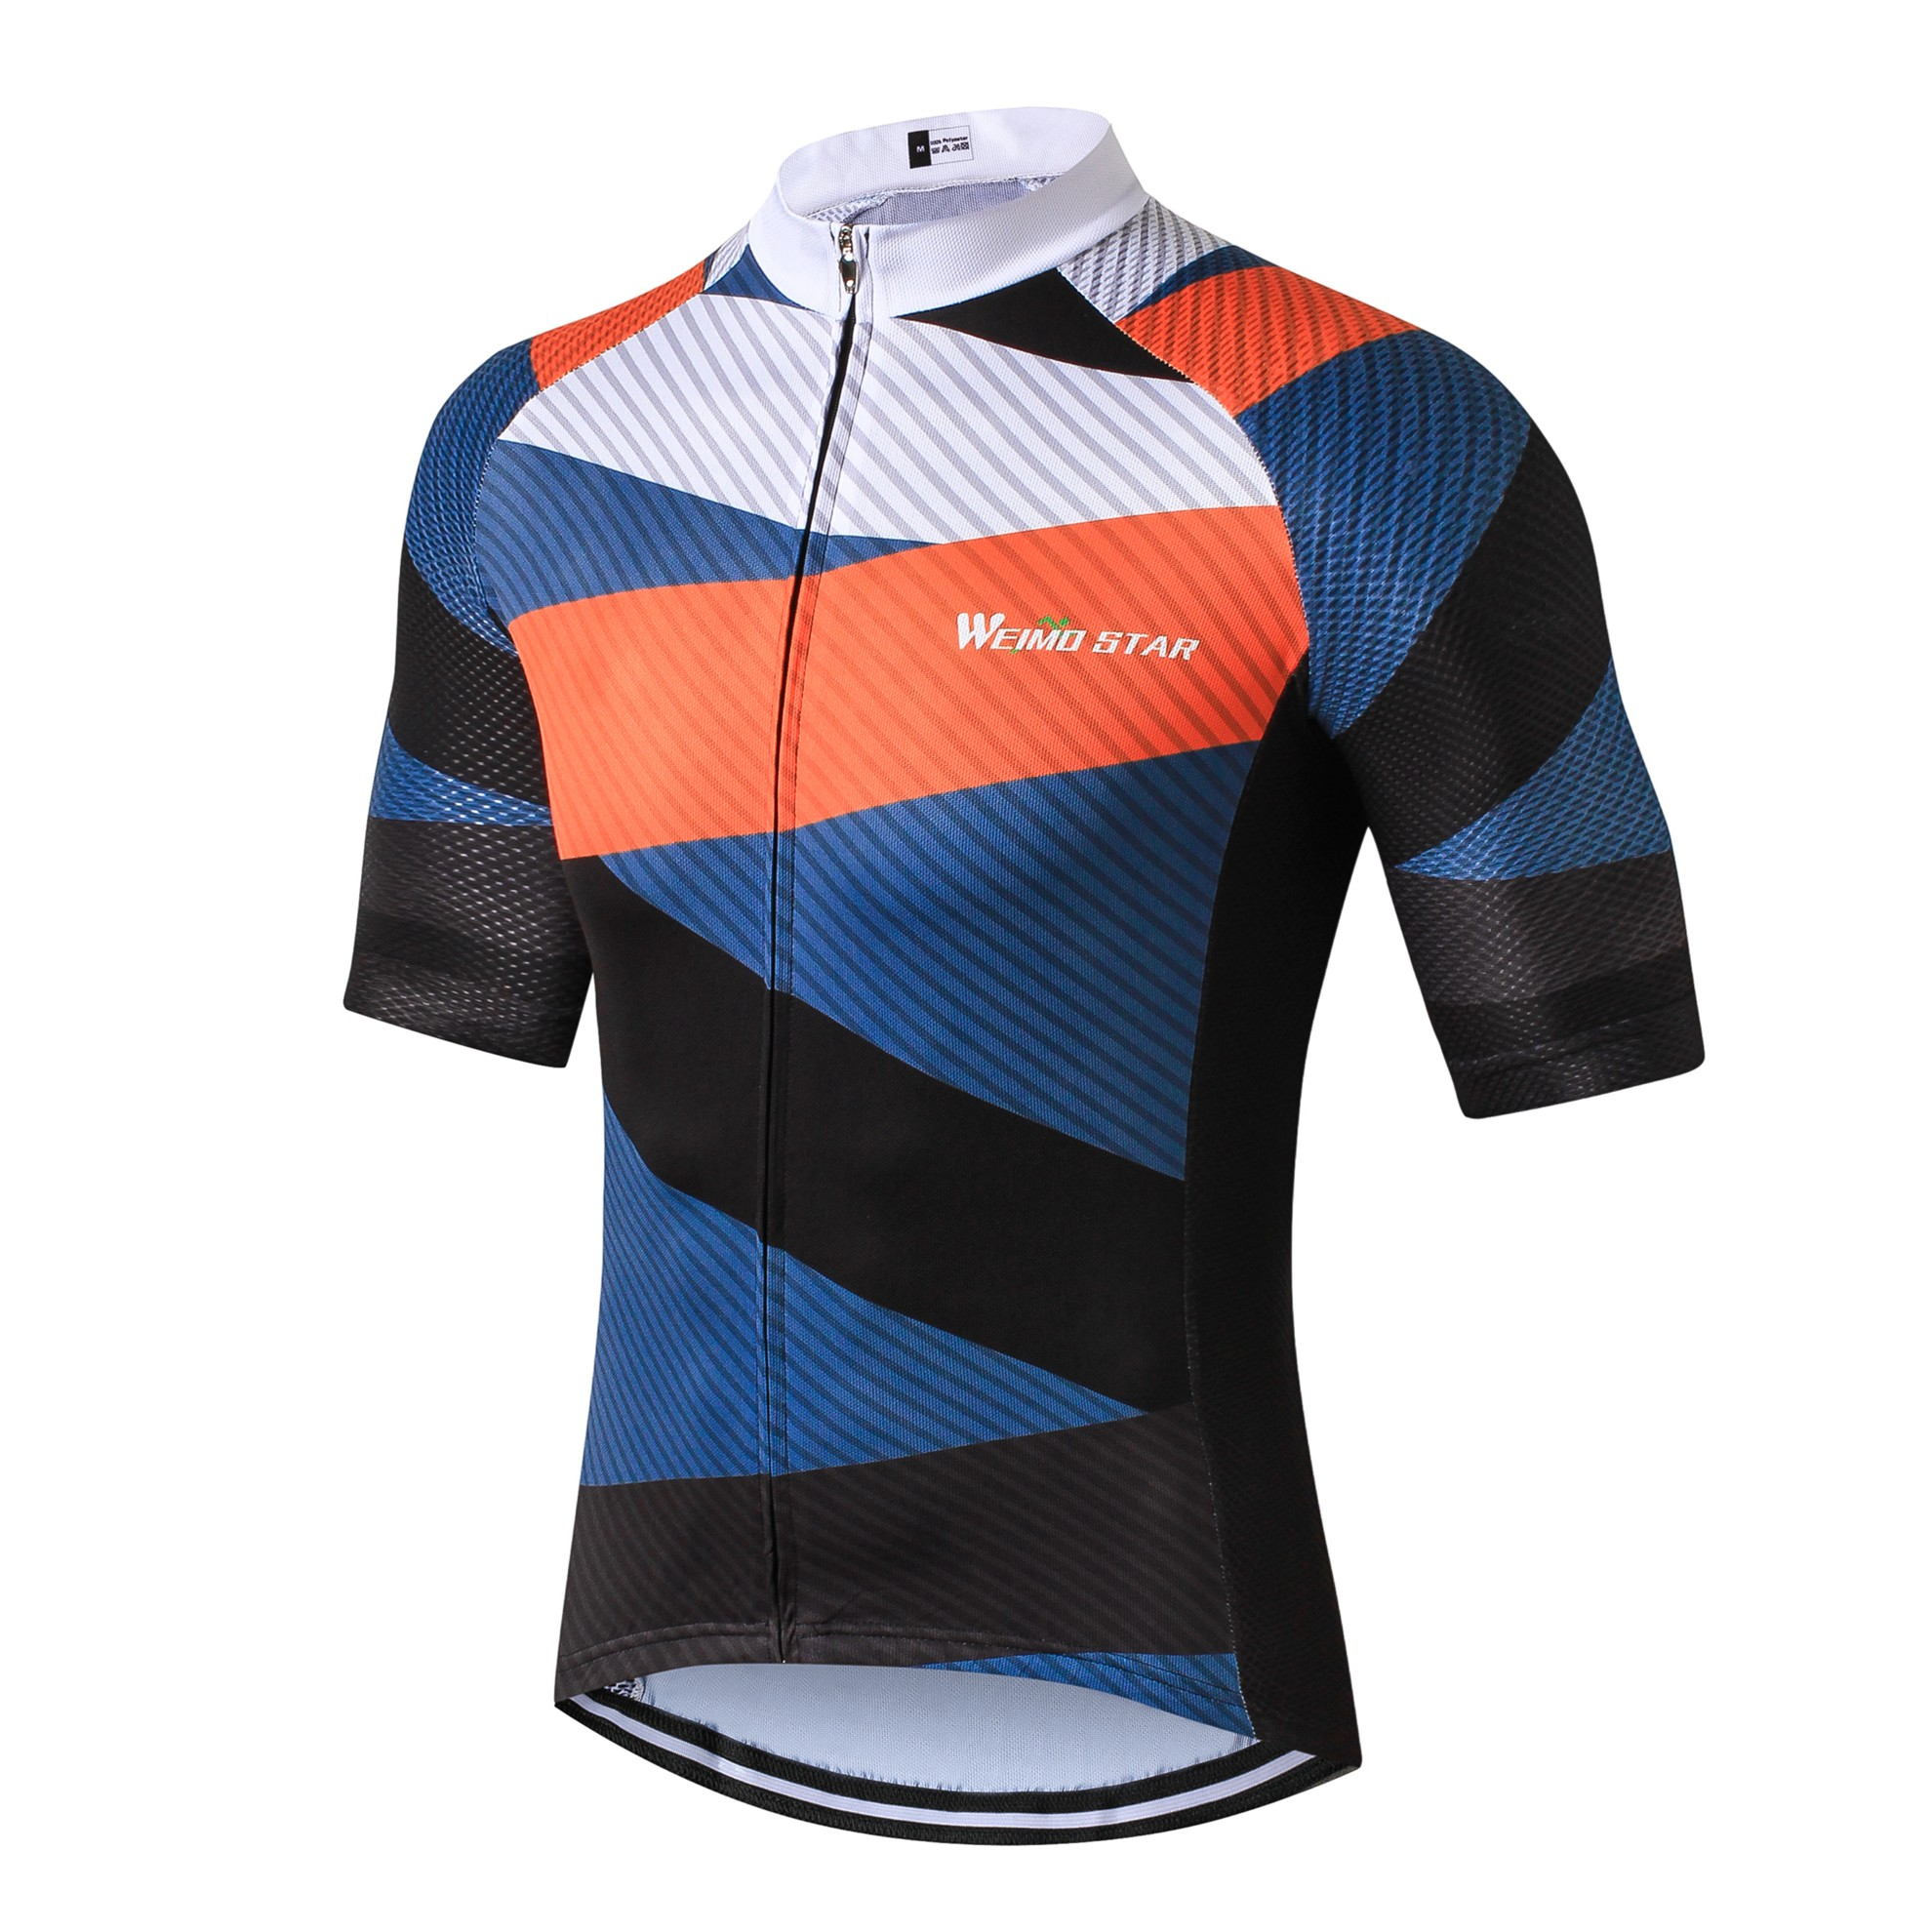 Dot Blue Racing Bike Pro Men's Bicycle Half Sleeve Cycling Jersey Shirts S-3XL